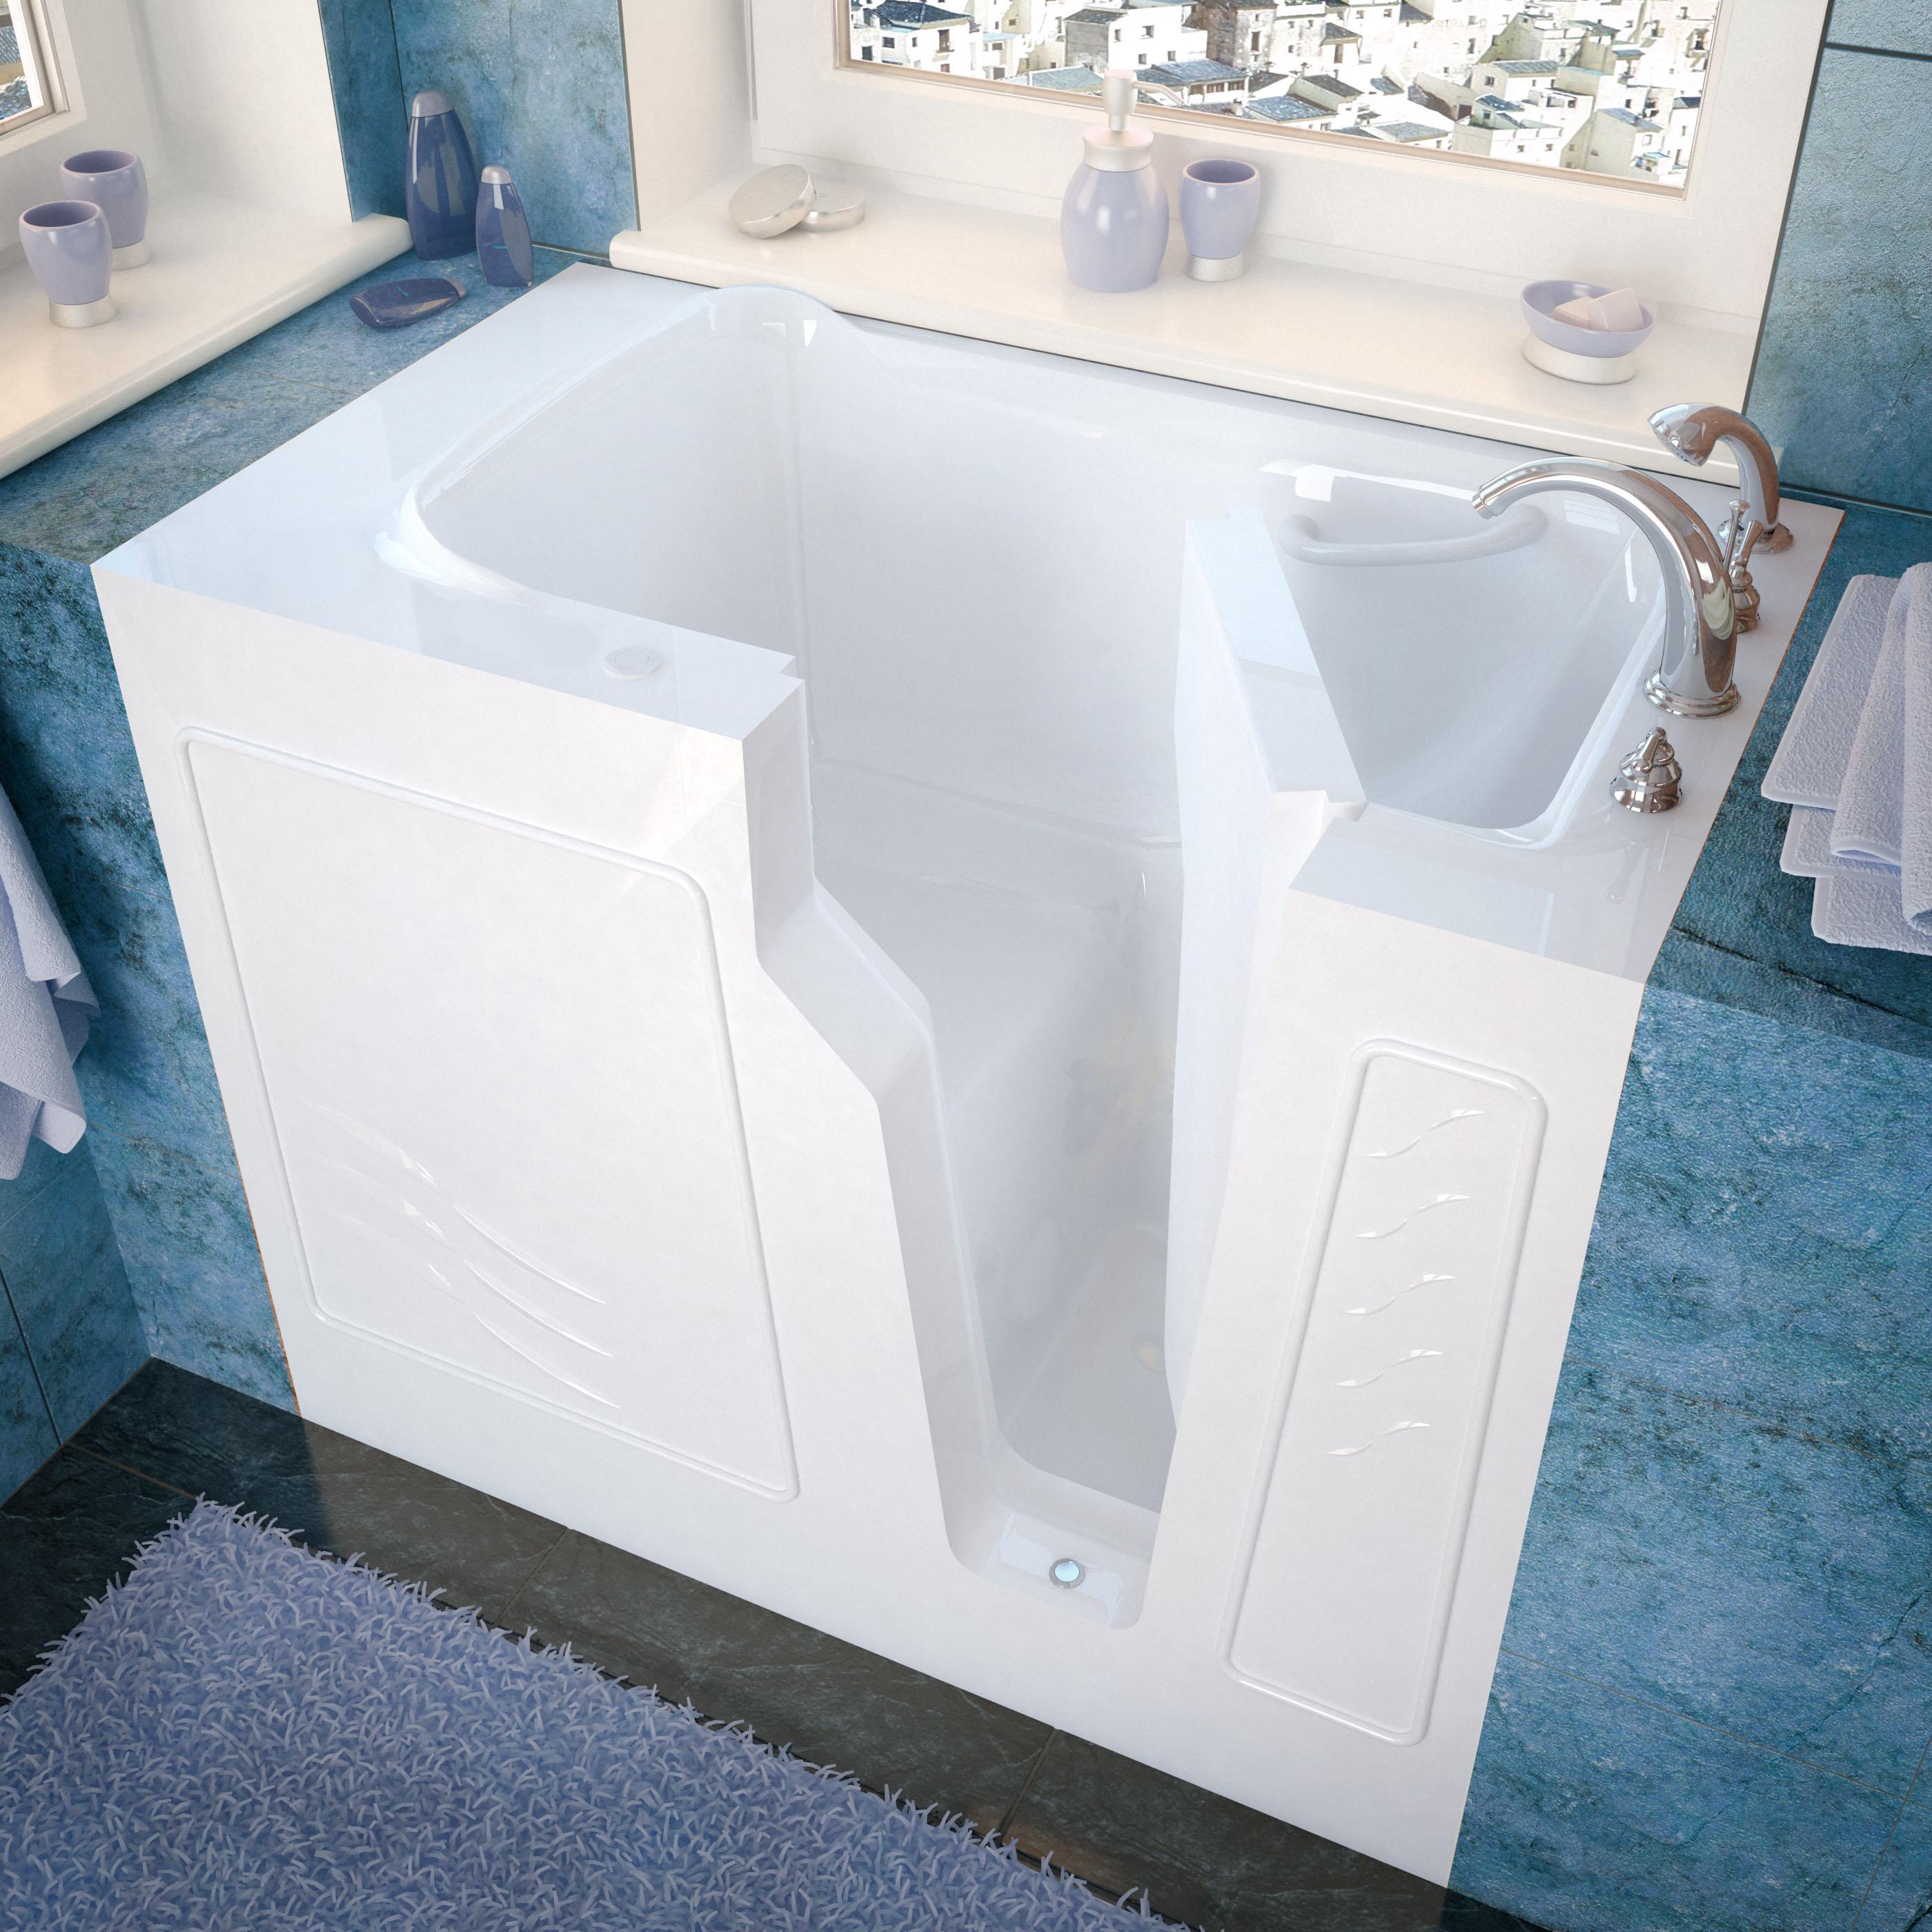 26x46 Right Drain White Soaking Walk-In Bathtub